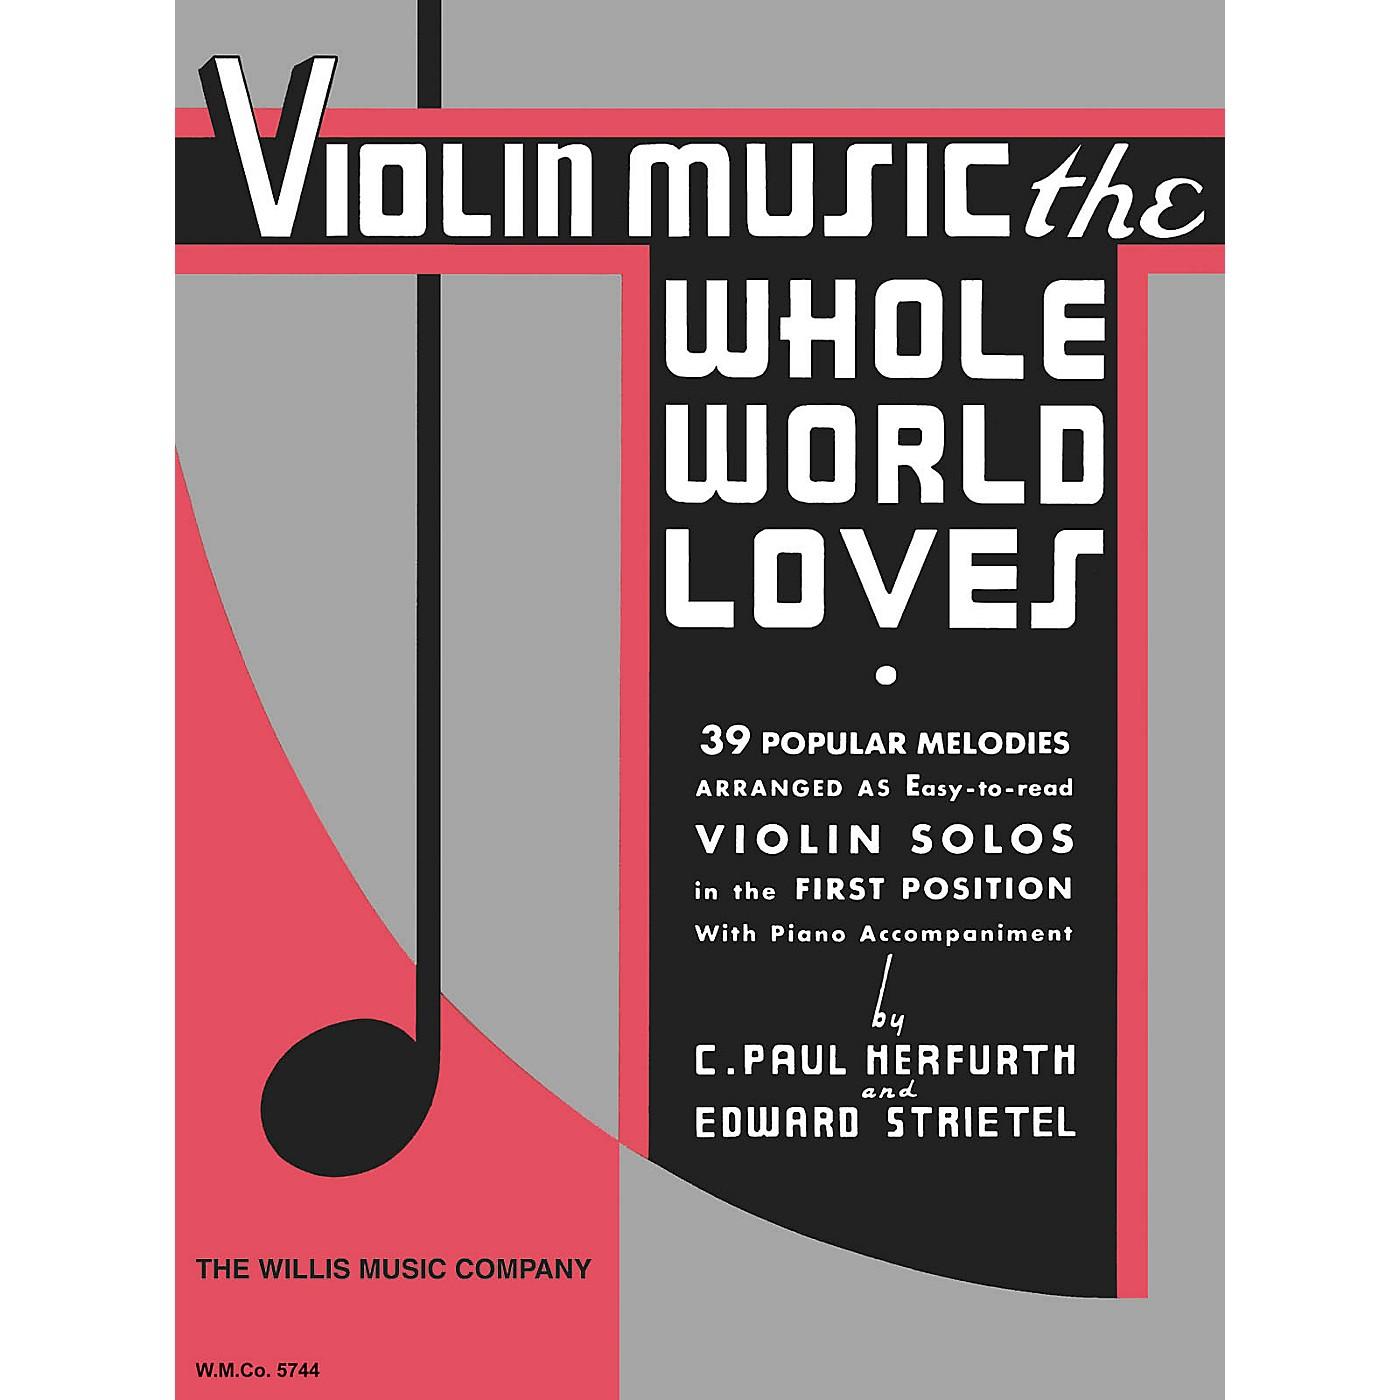 Willis Music Violin Music the Whole World Willis Series thumbnail